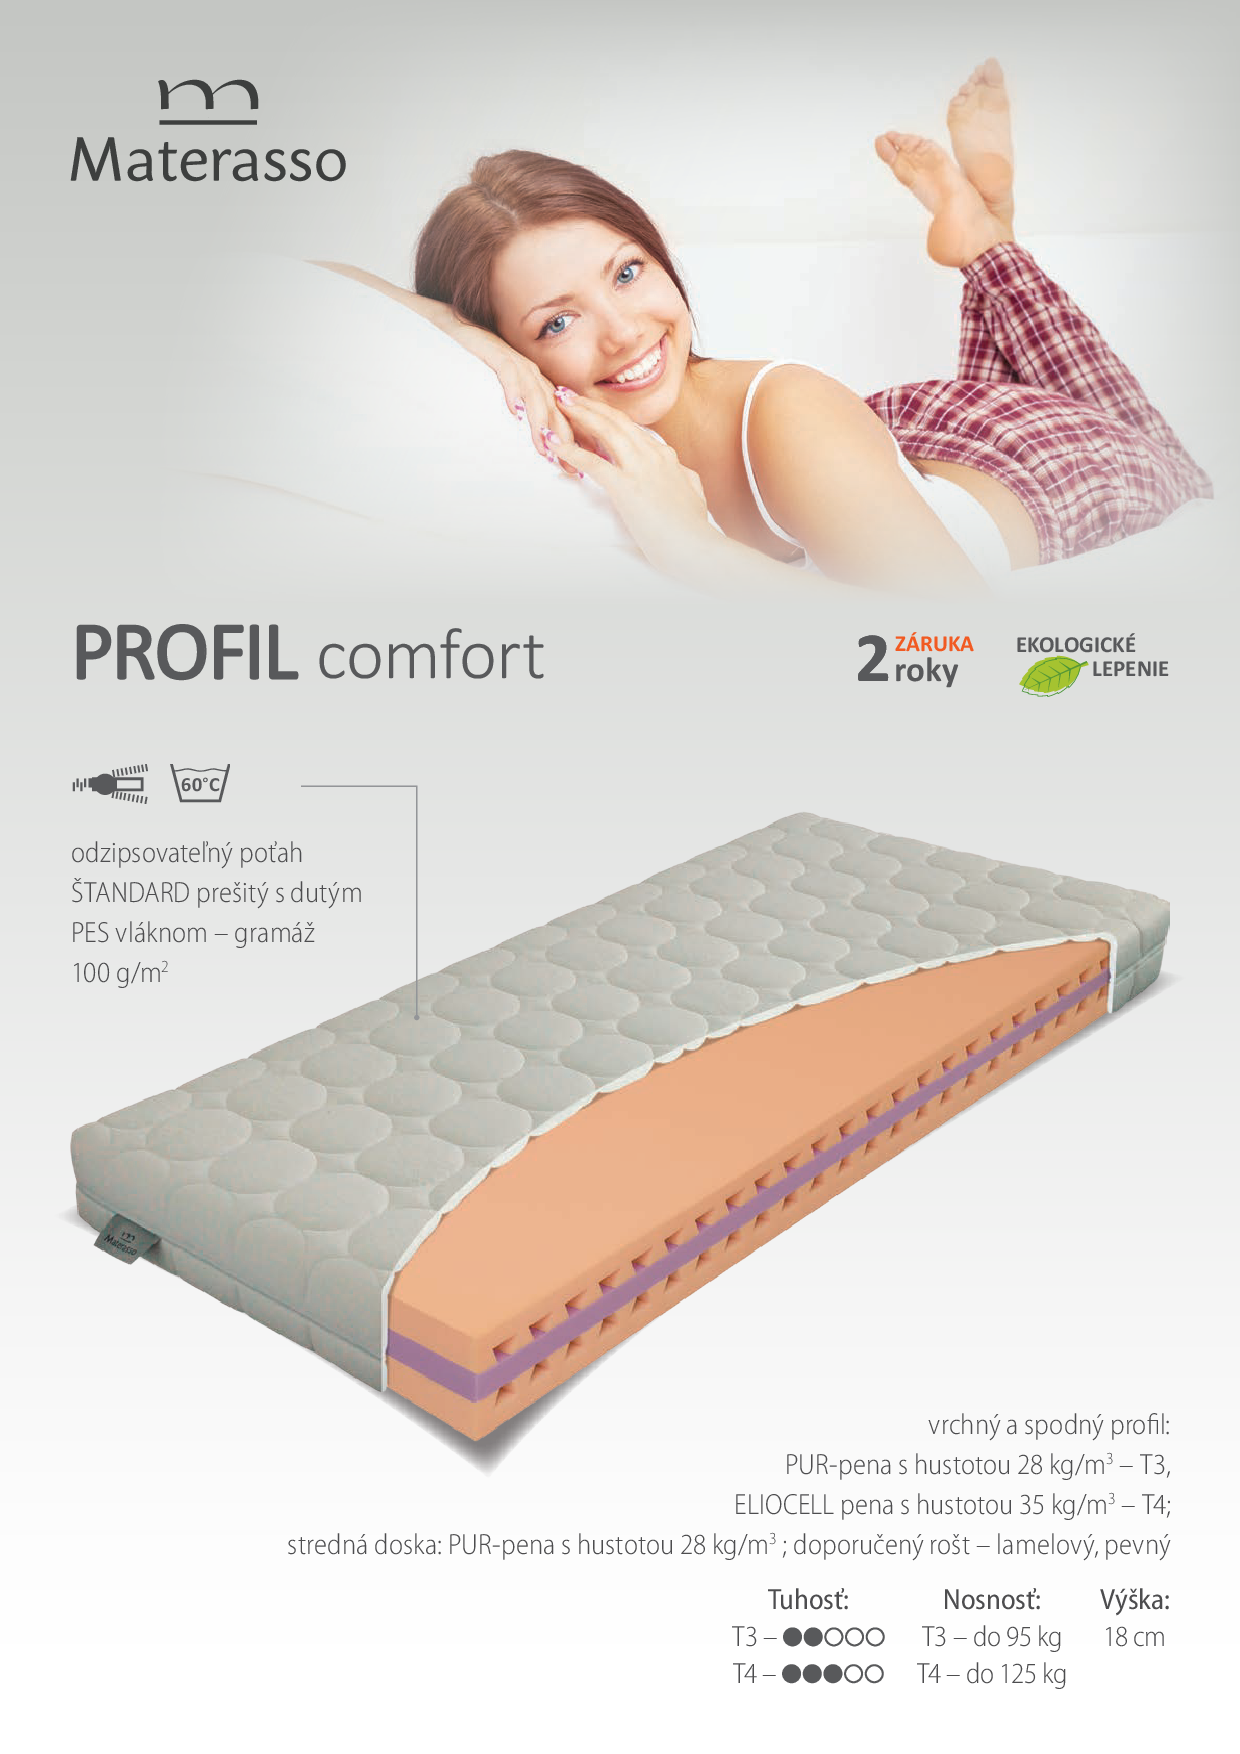 Profil comfort